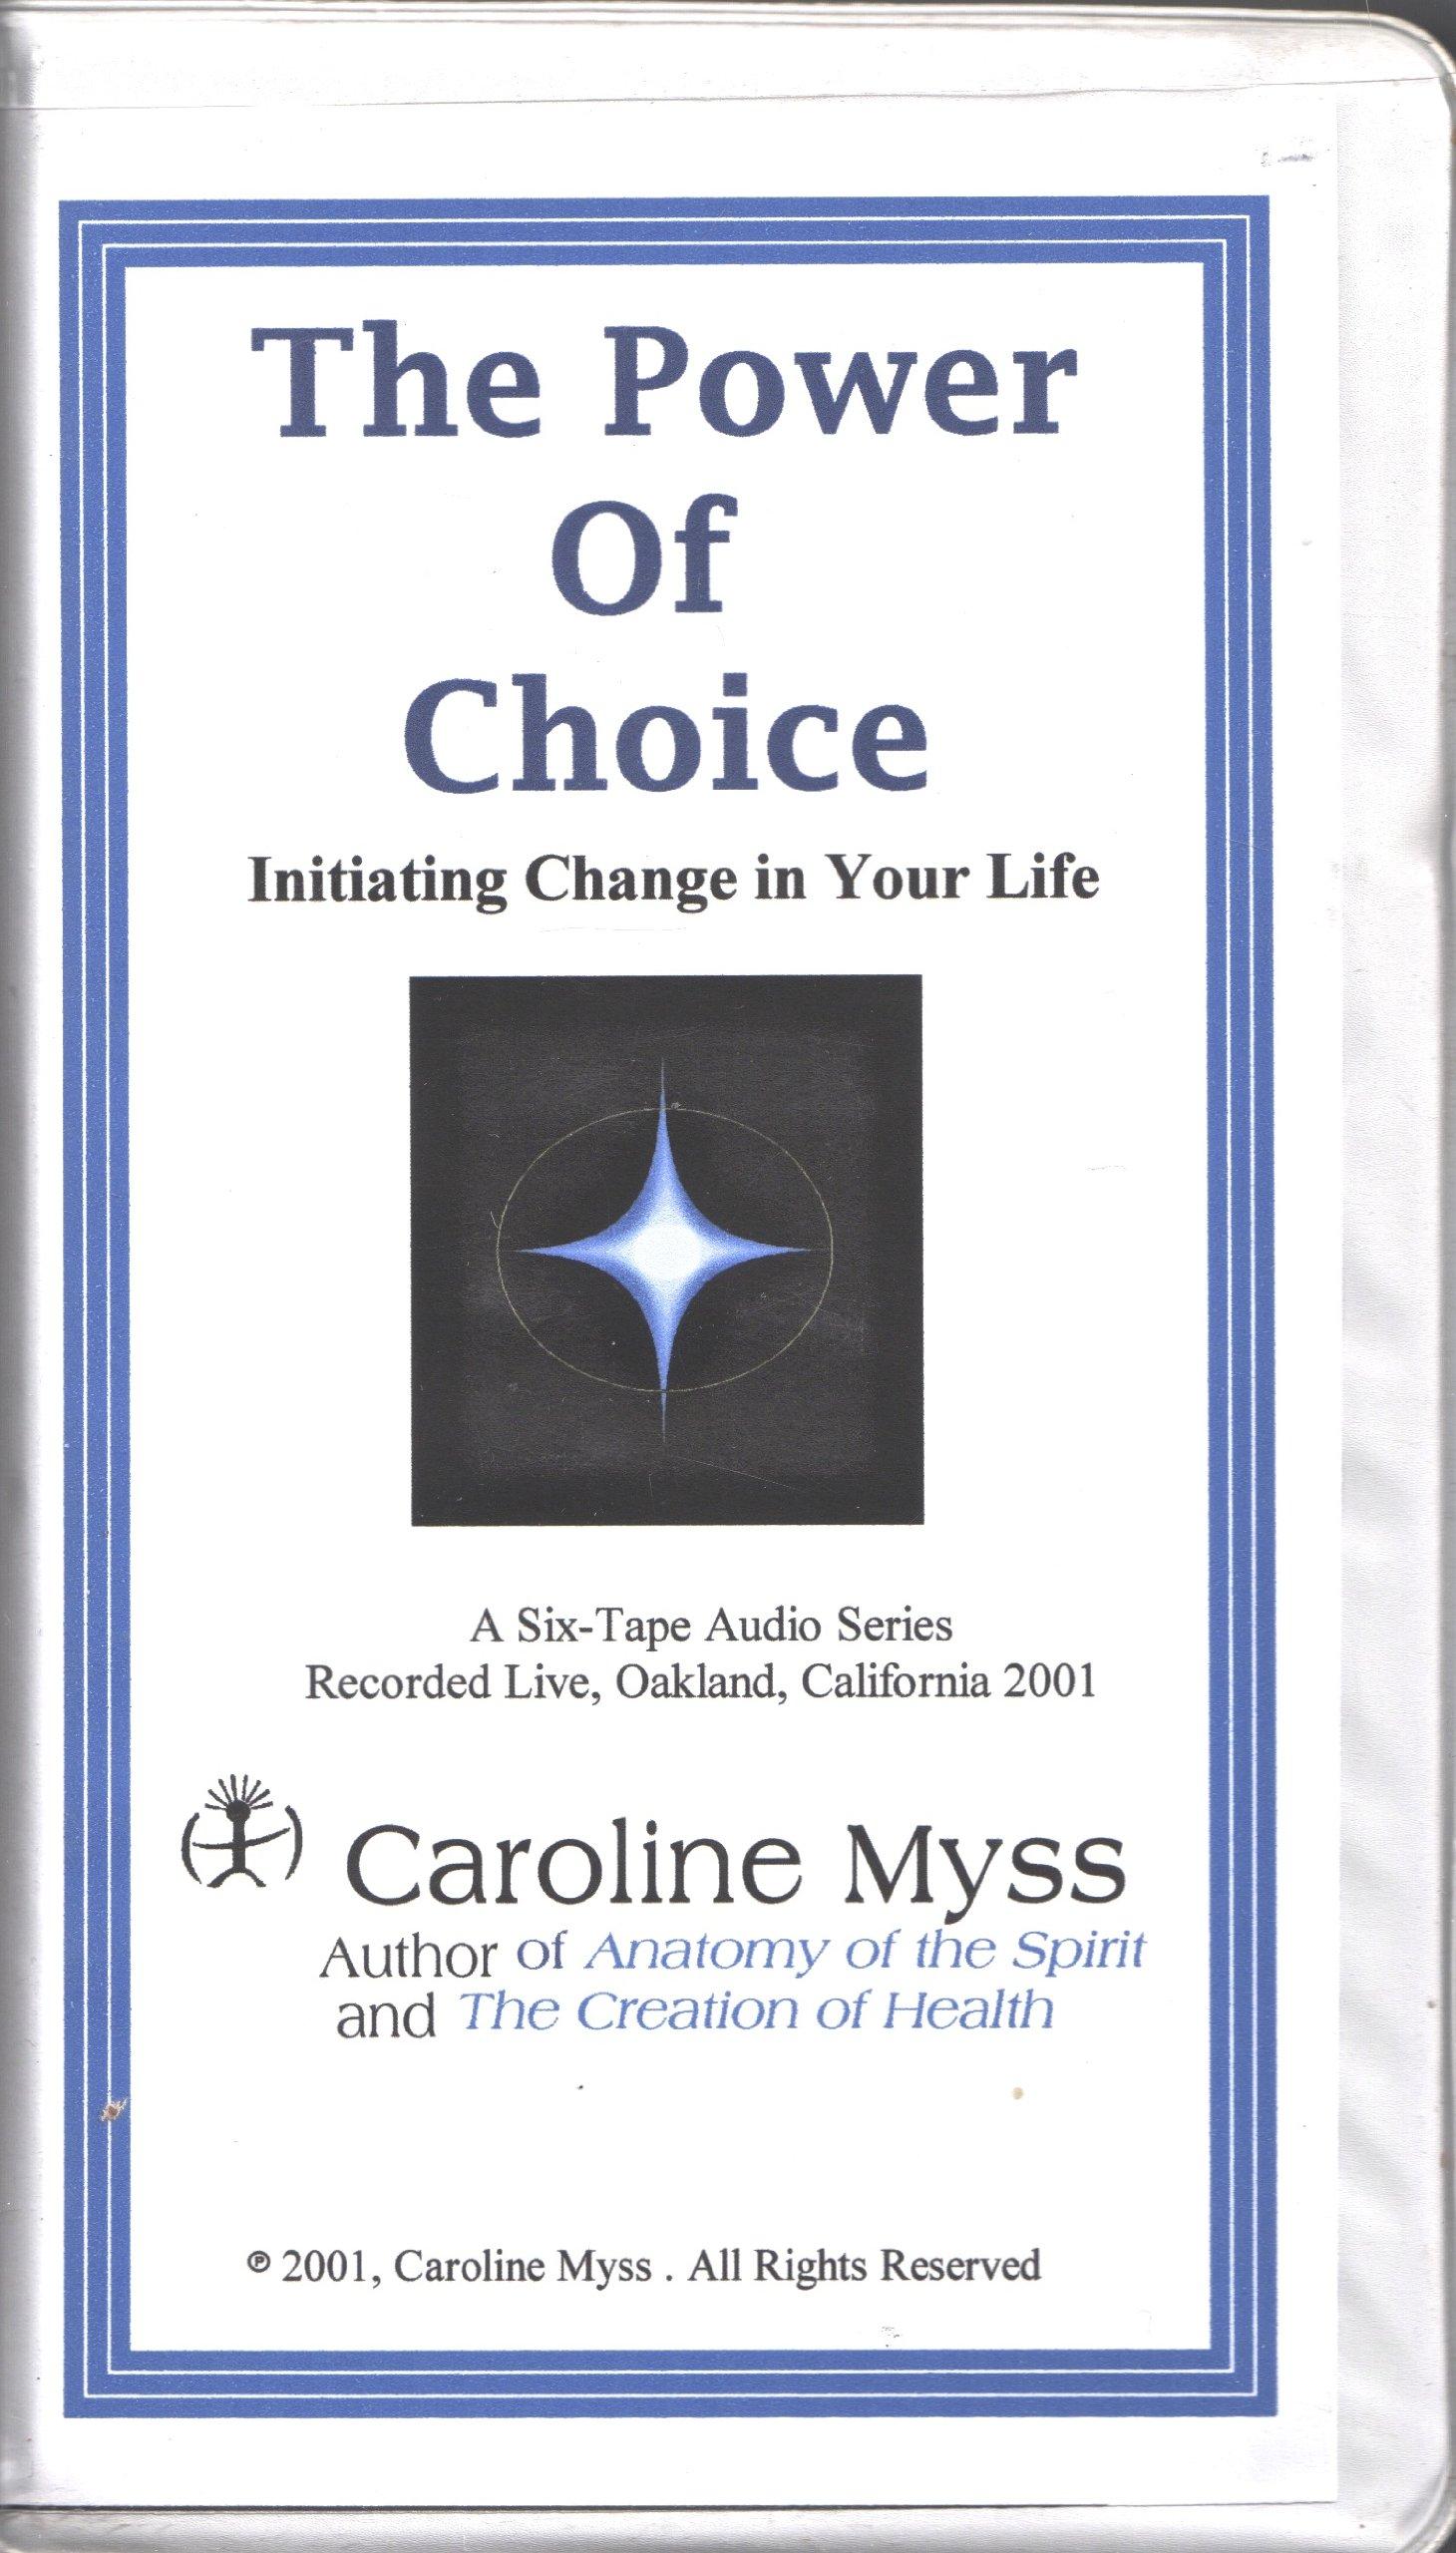 The Power of Choice: Caroline Myss: Amazon.com: Books